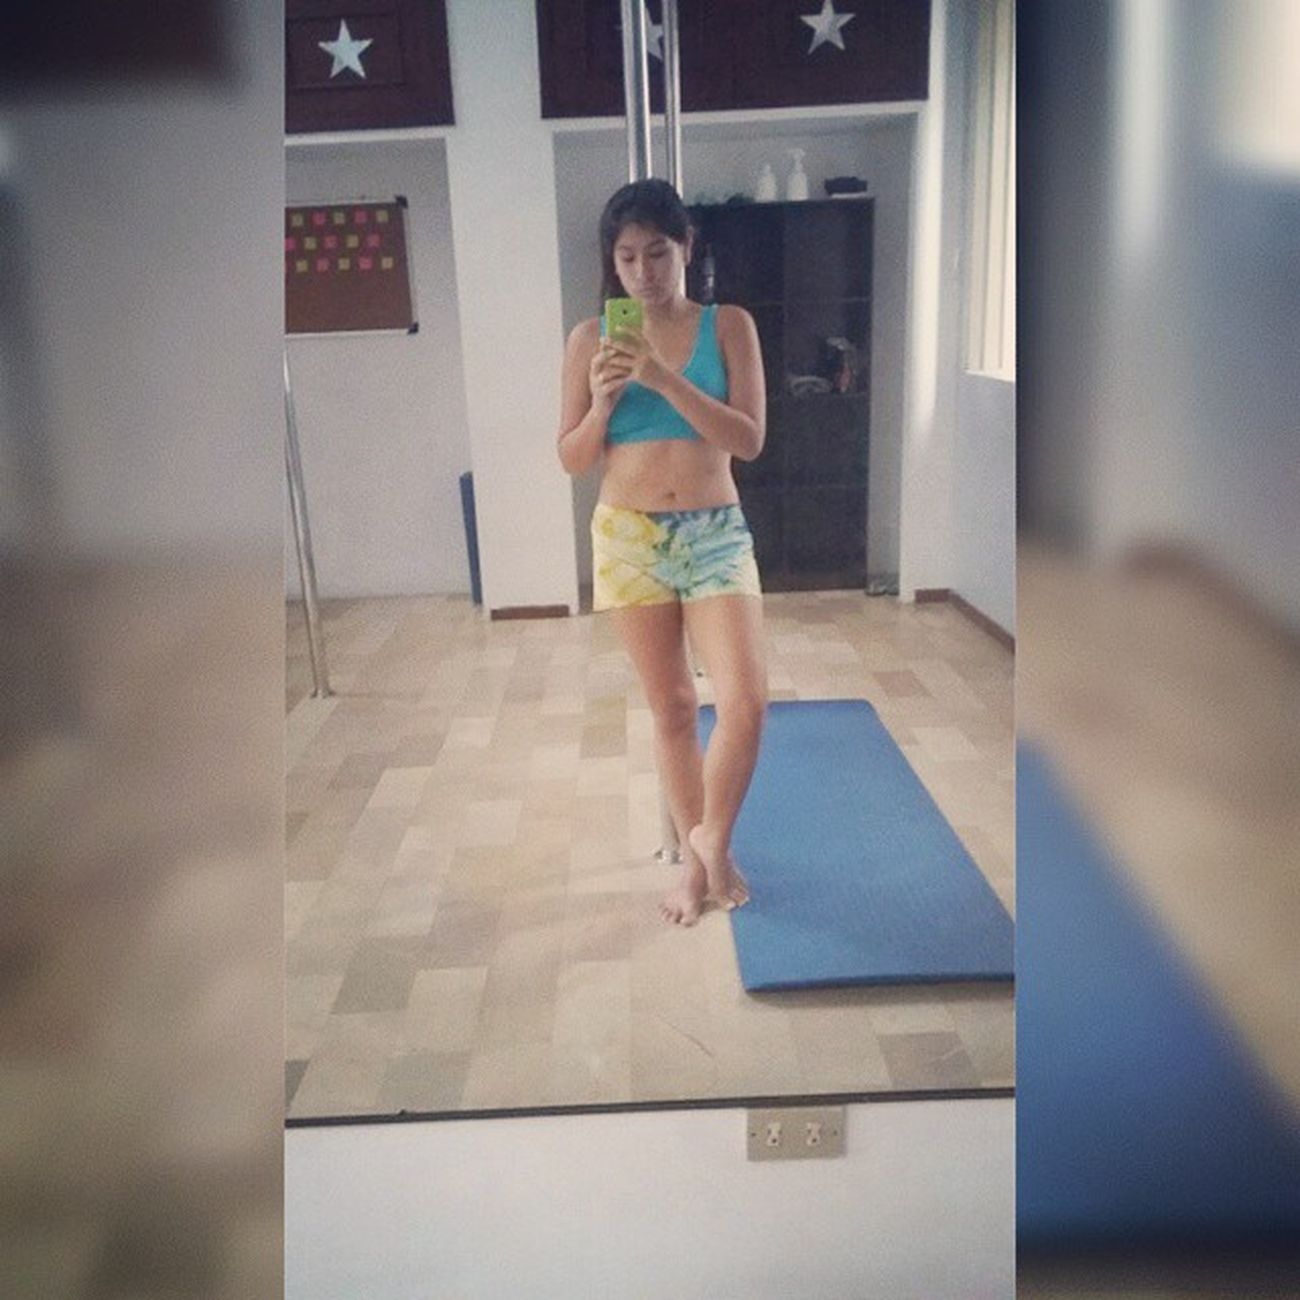 Training Aerialpolefitstudio Mejorando Decalentamiento💪 Depocoapocoseempieza💪✌😰😜😰